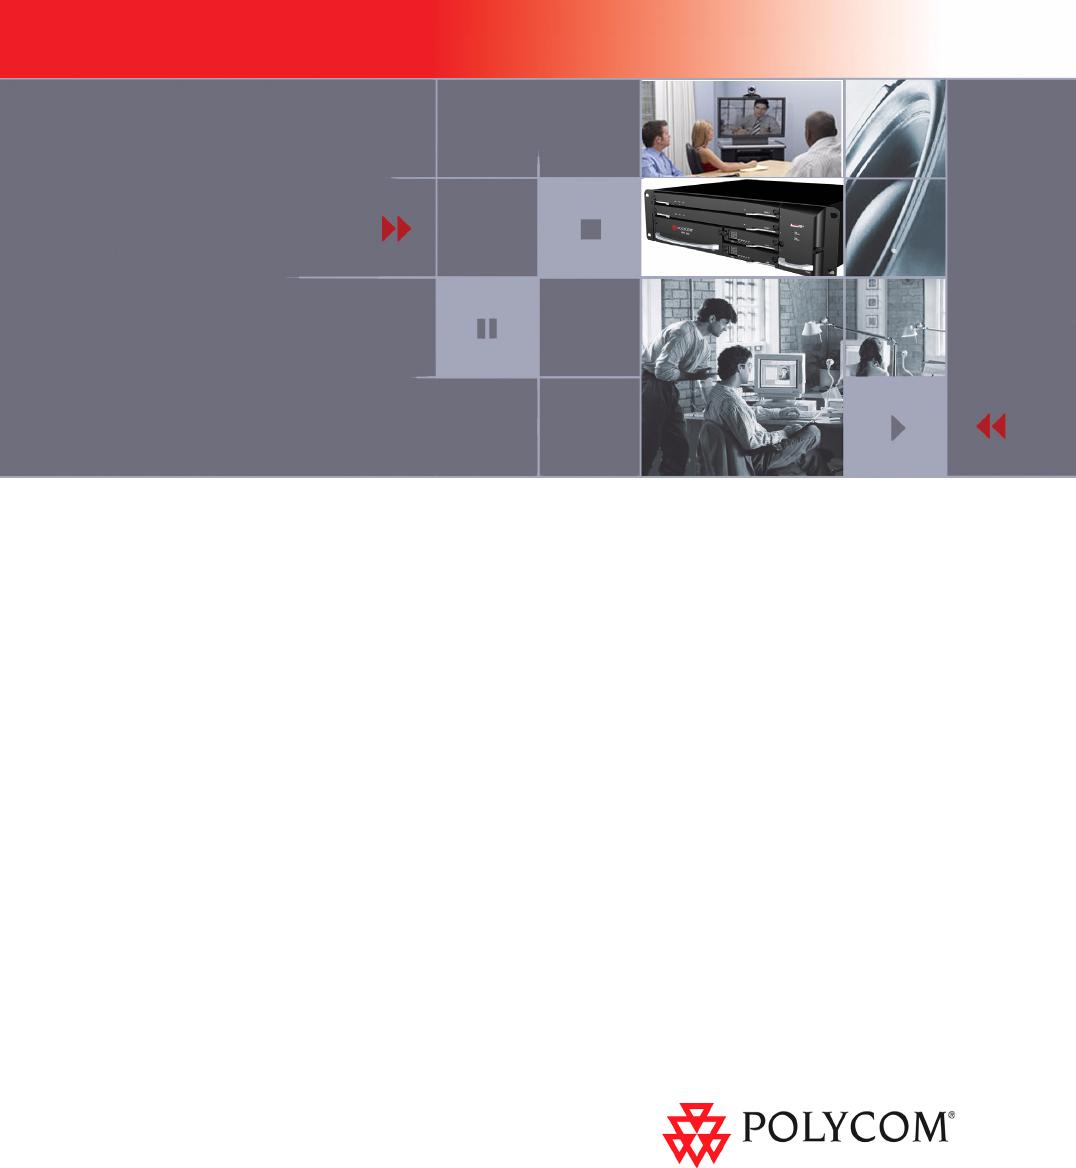 rmx 2000 hardware guide today manual guide trends sample u2022 rh brookejasmine co Polycom RMX 2000 Pricing Polycom Telepresence